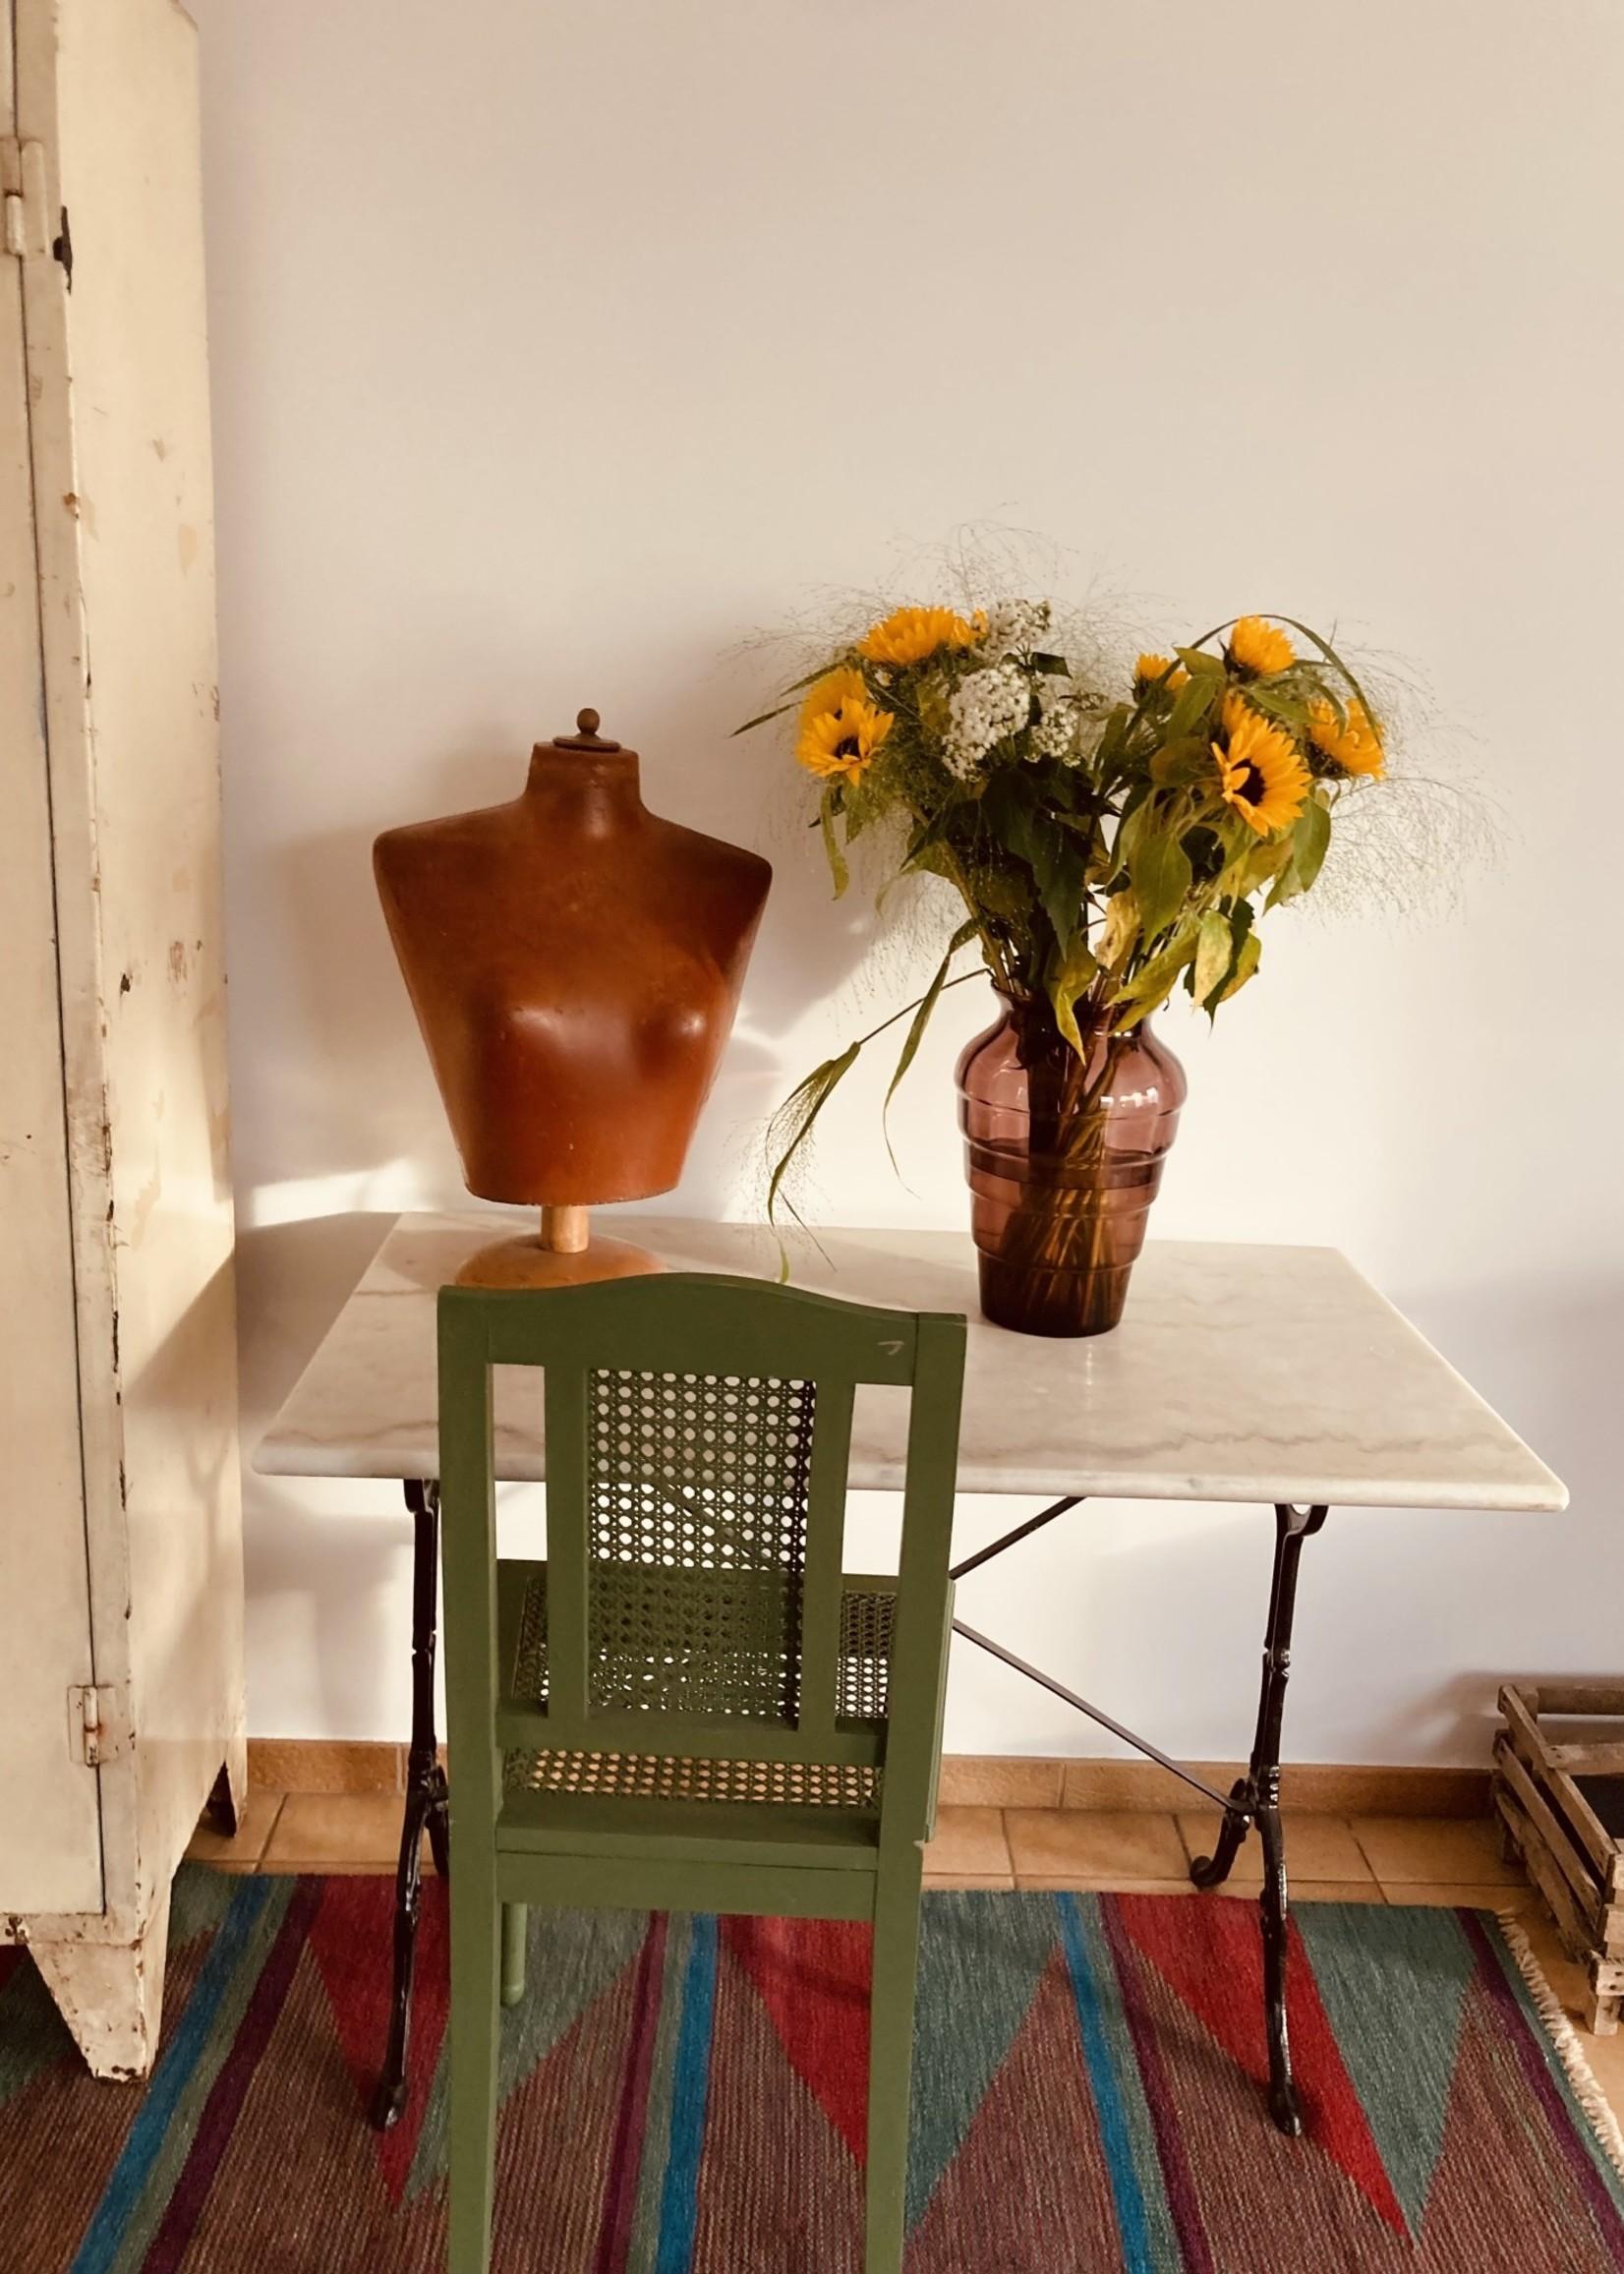 Doyen Doyen Vase high and large in Burgundy color